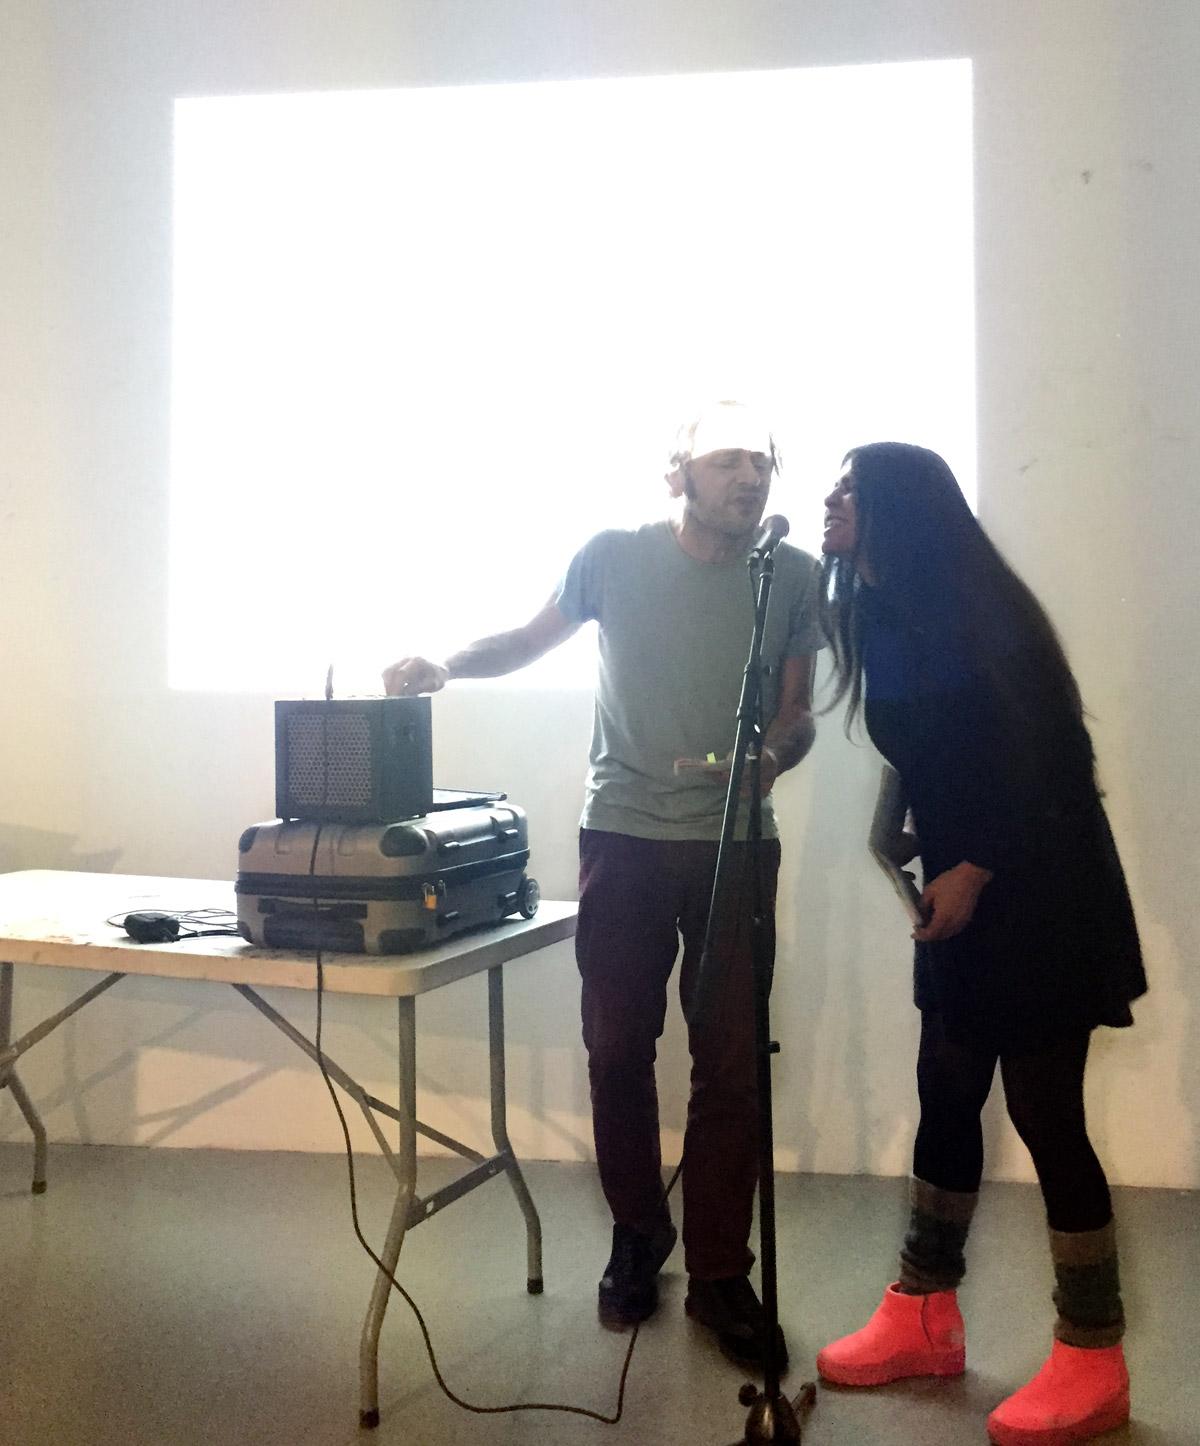 Performance piece by Luna Montenegro and Adrian Fisher based on Álvaro Guevara's poems, Slade School of Arts, London